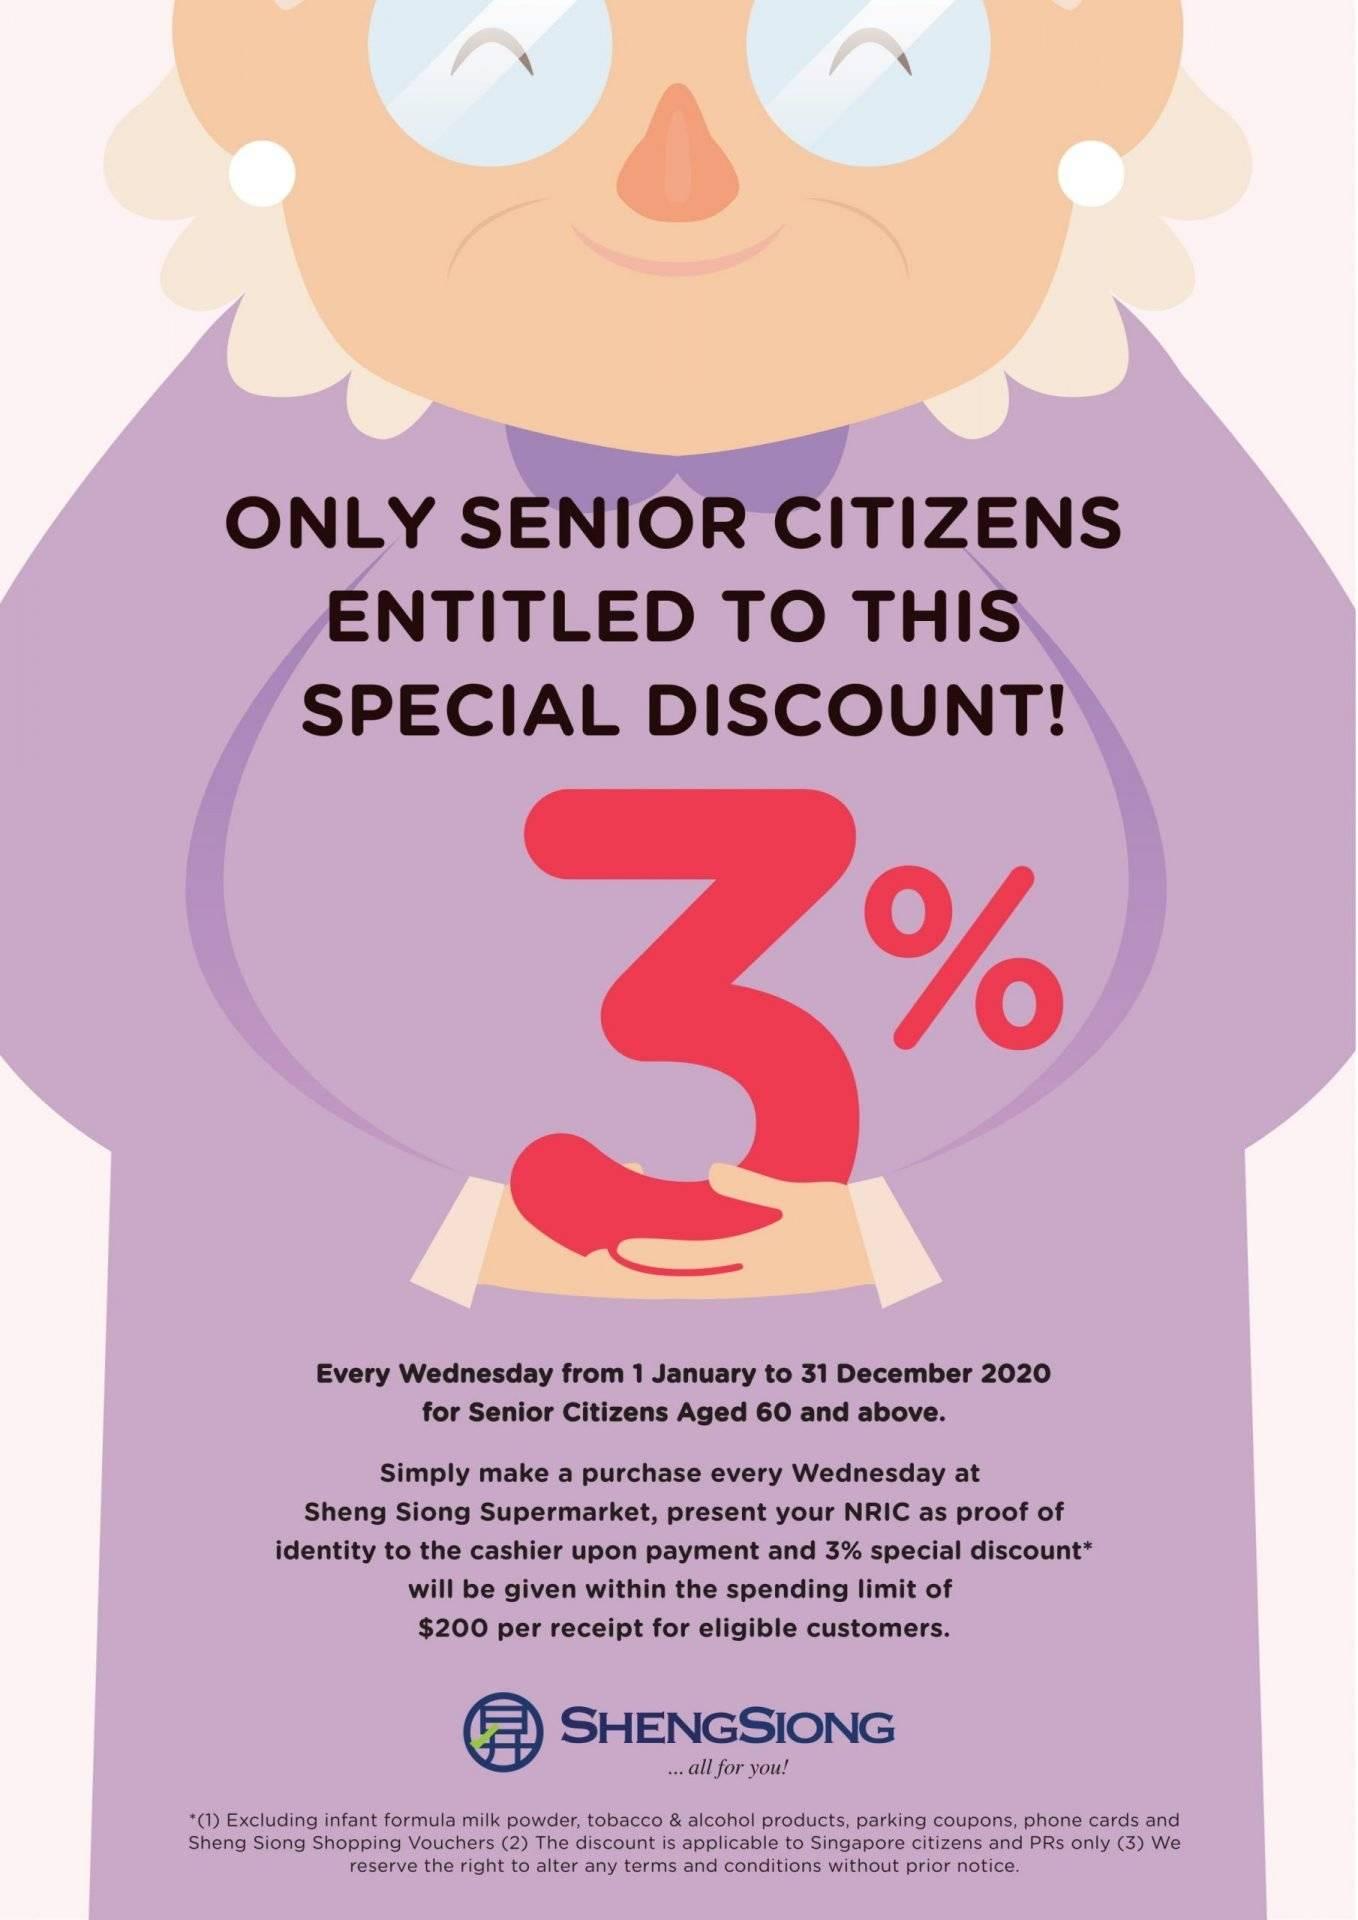 Senior Citizens Enjoys Additional 3% Discounts